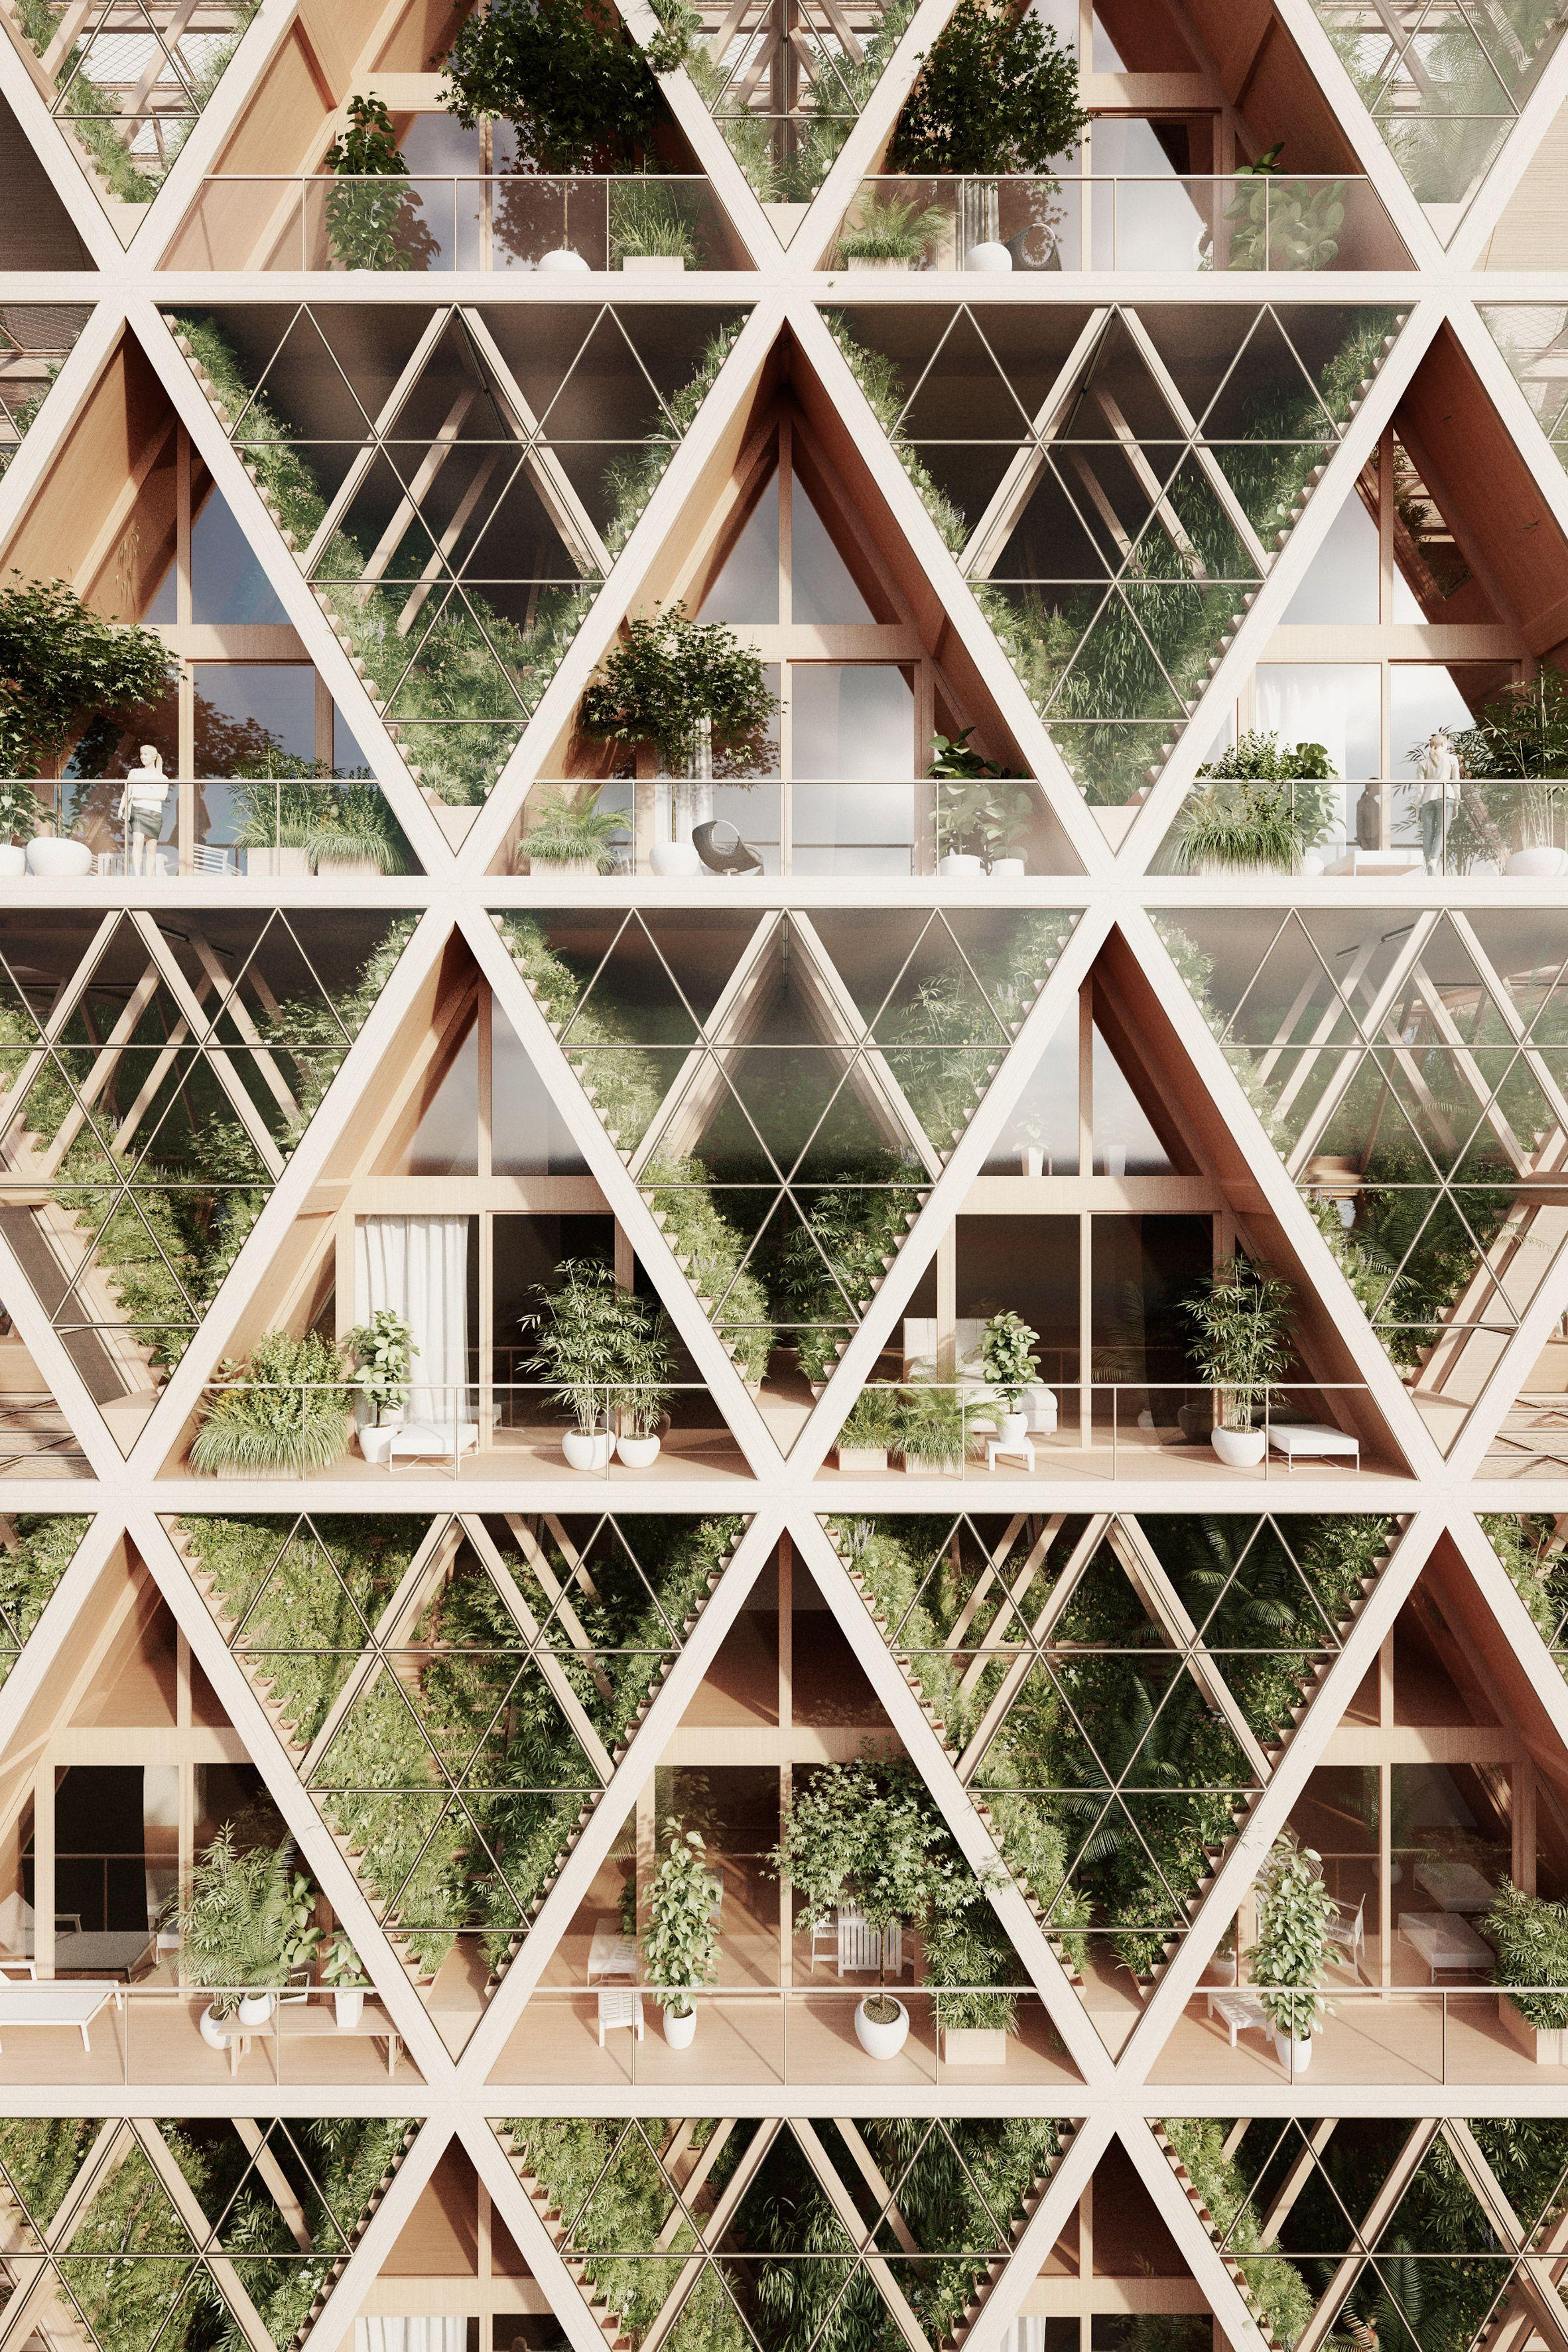 Precht S The Farmhouse Concept Combines Modular Homes With Vertical Farms Green Architecture Eco Architecture Sustainable Architecture